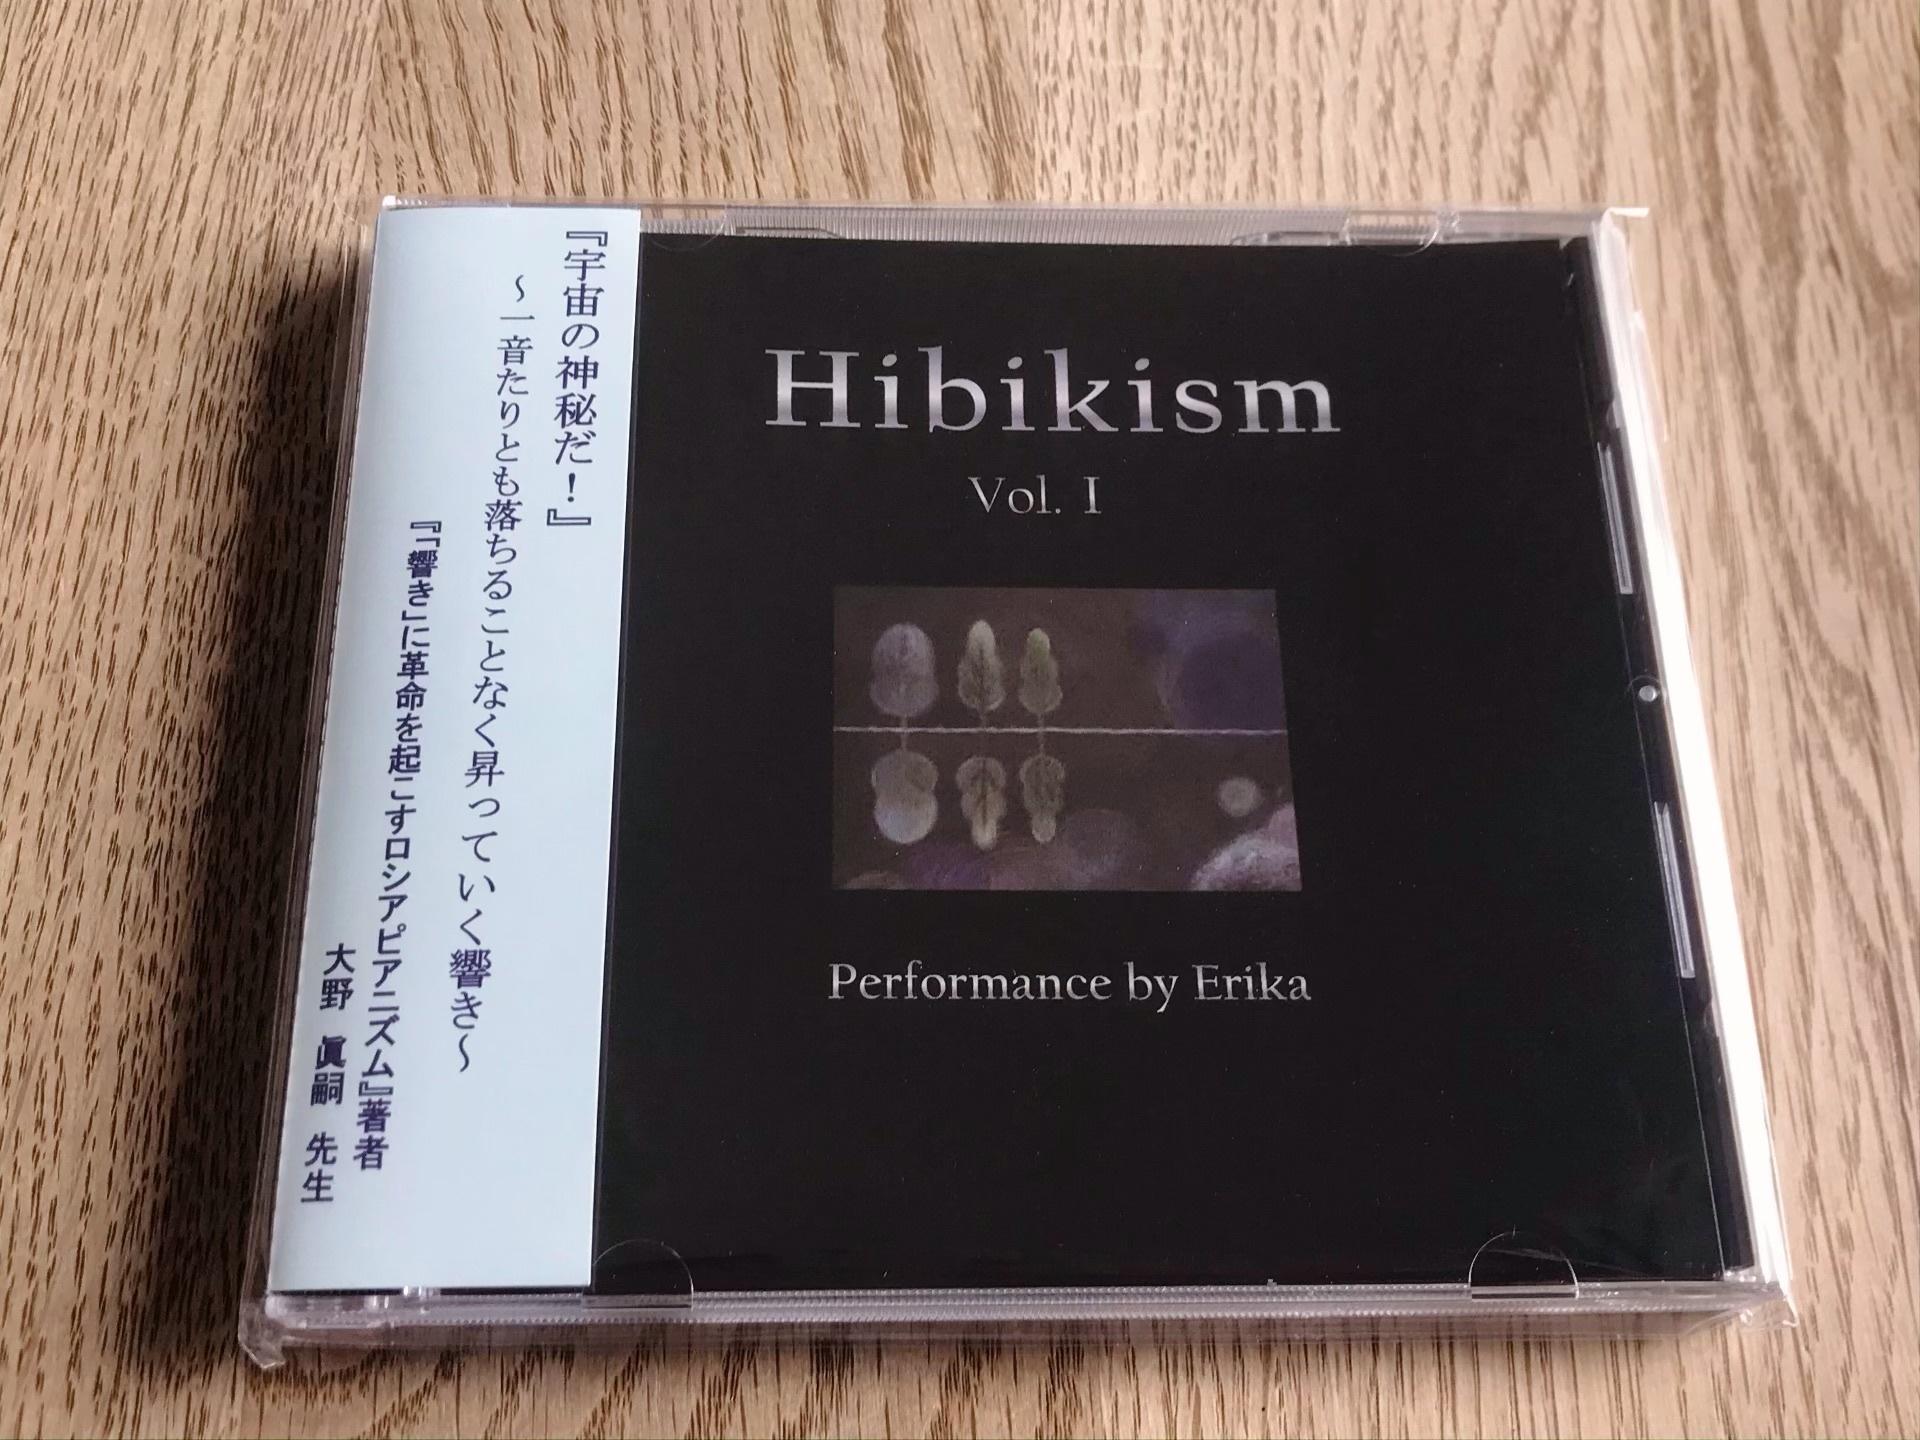 Hibikism vol.Ⅰ CD